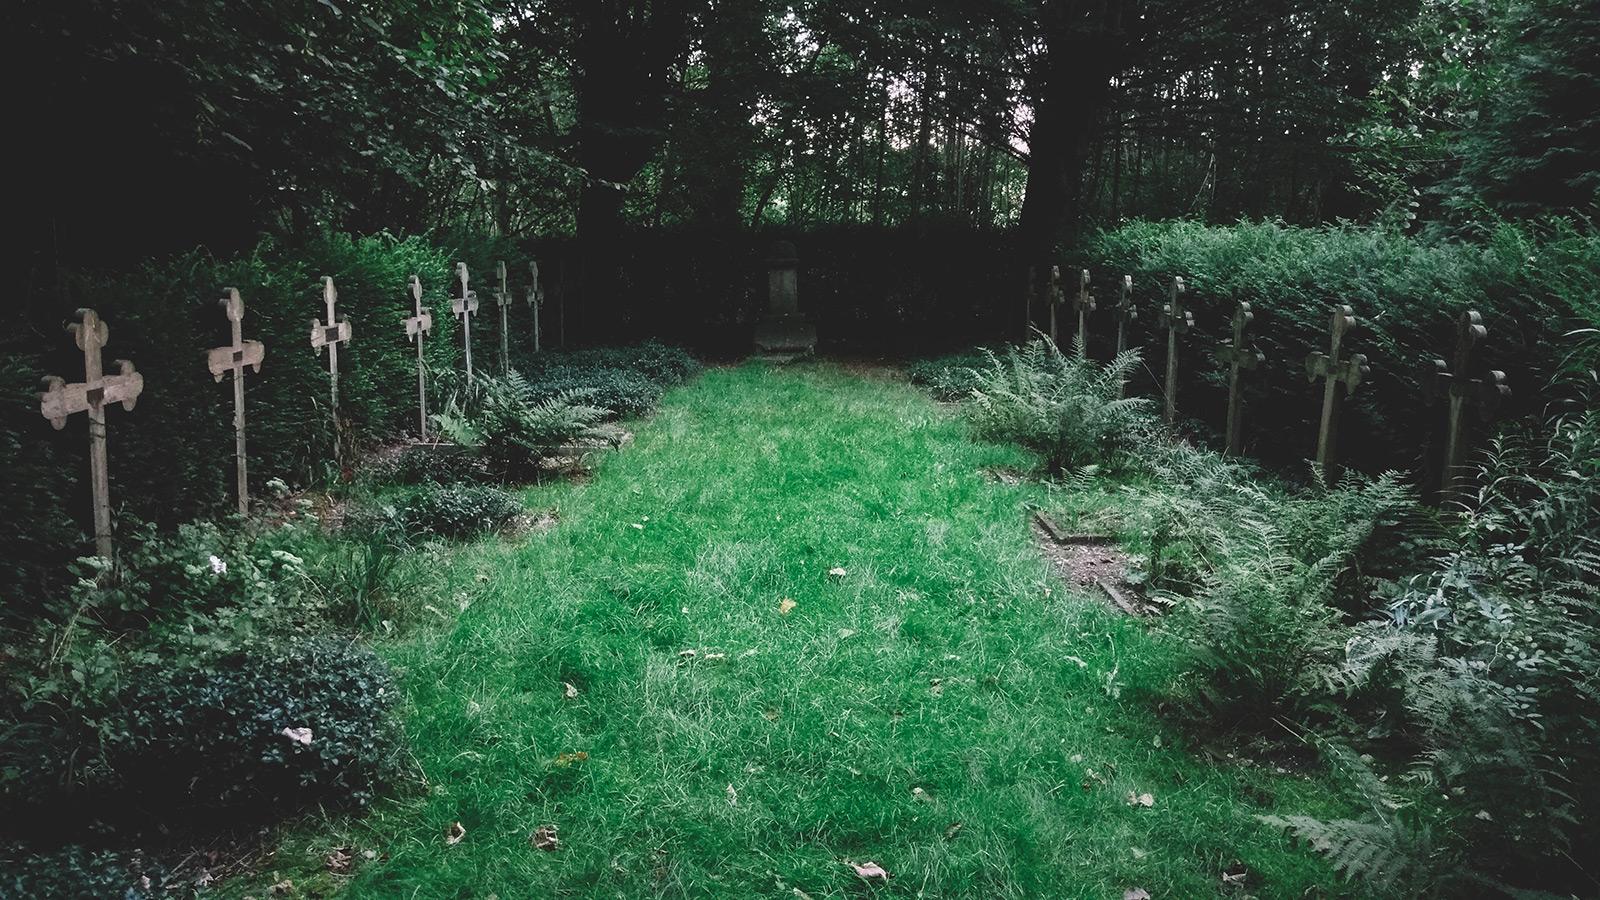 acourseindying_nijmegen_cemetery_ubbergen_refter_nuns_02